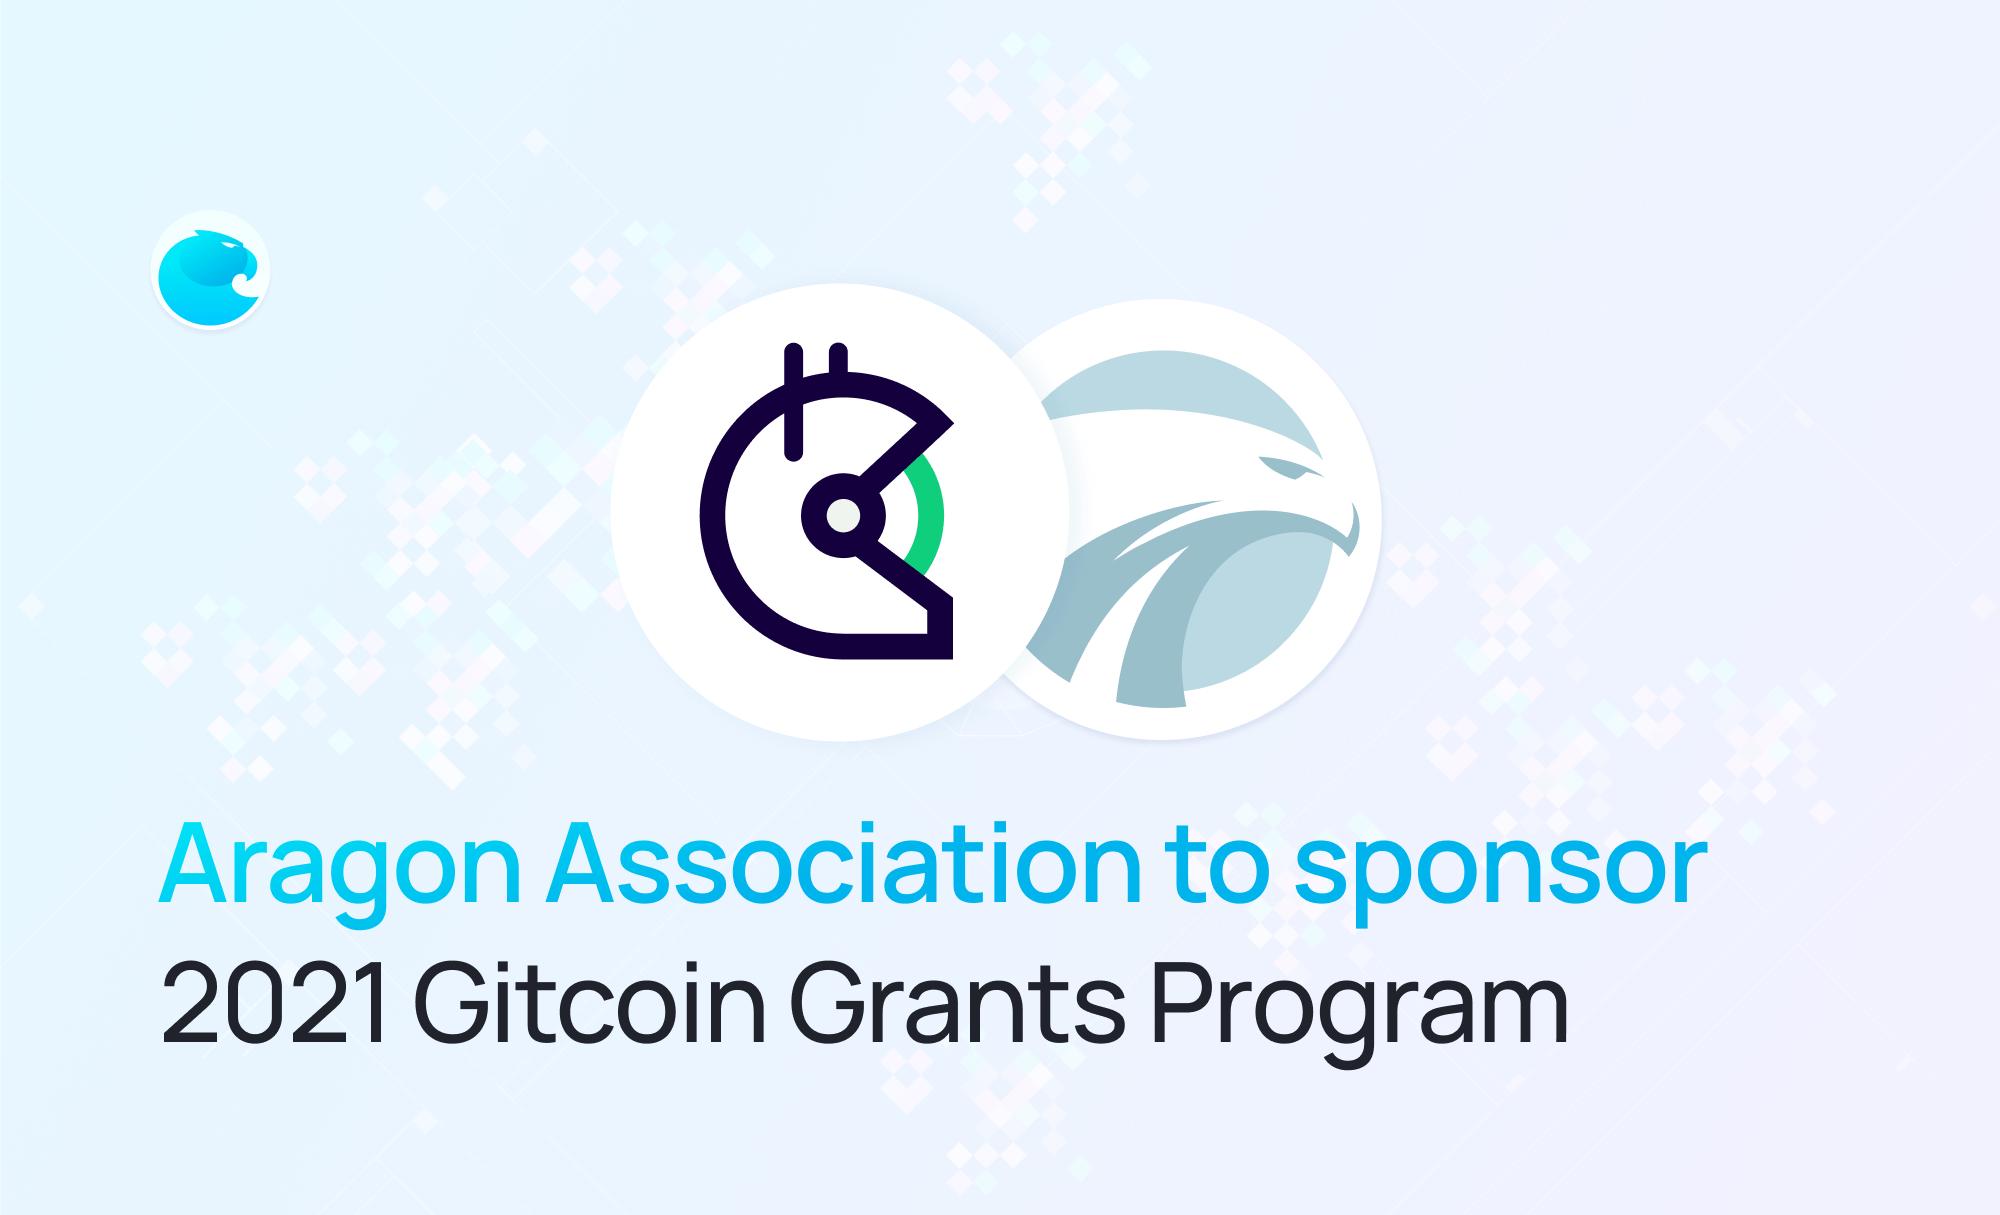 Aragon Association to Sponsor 2021 Gitcoin Grants Program